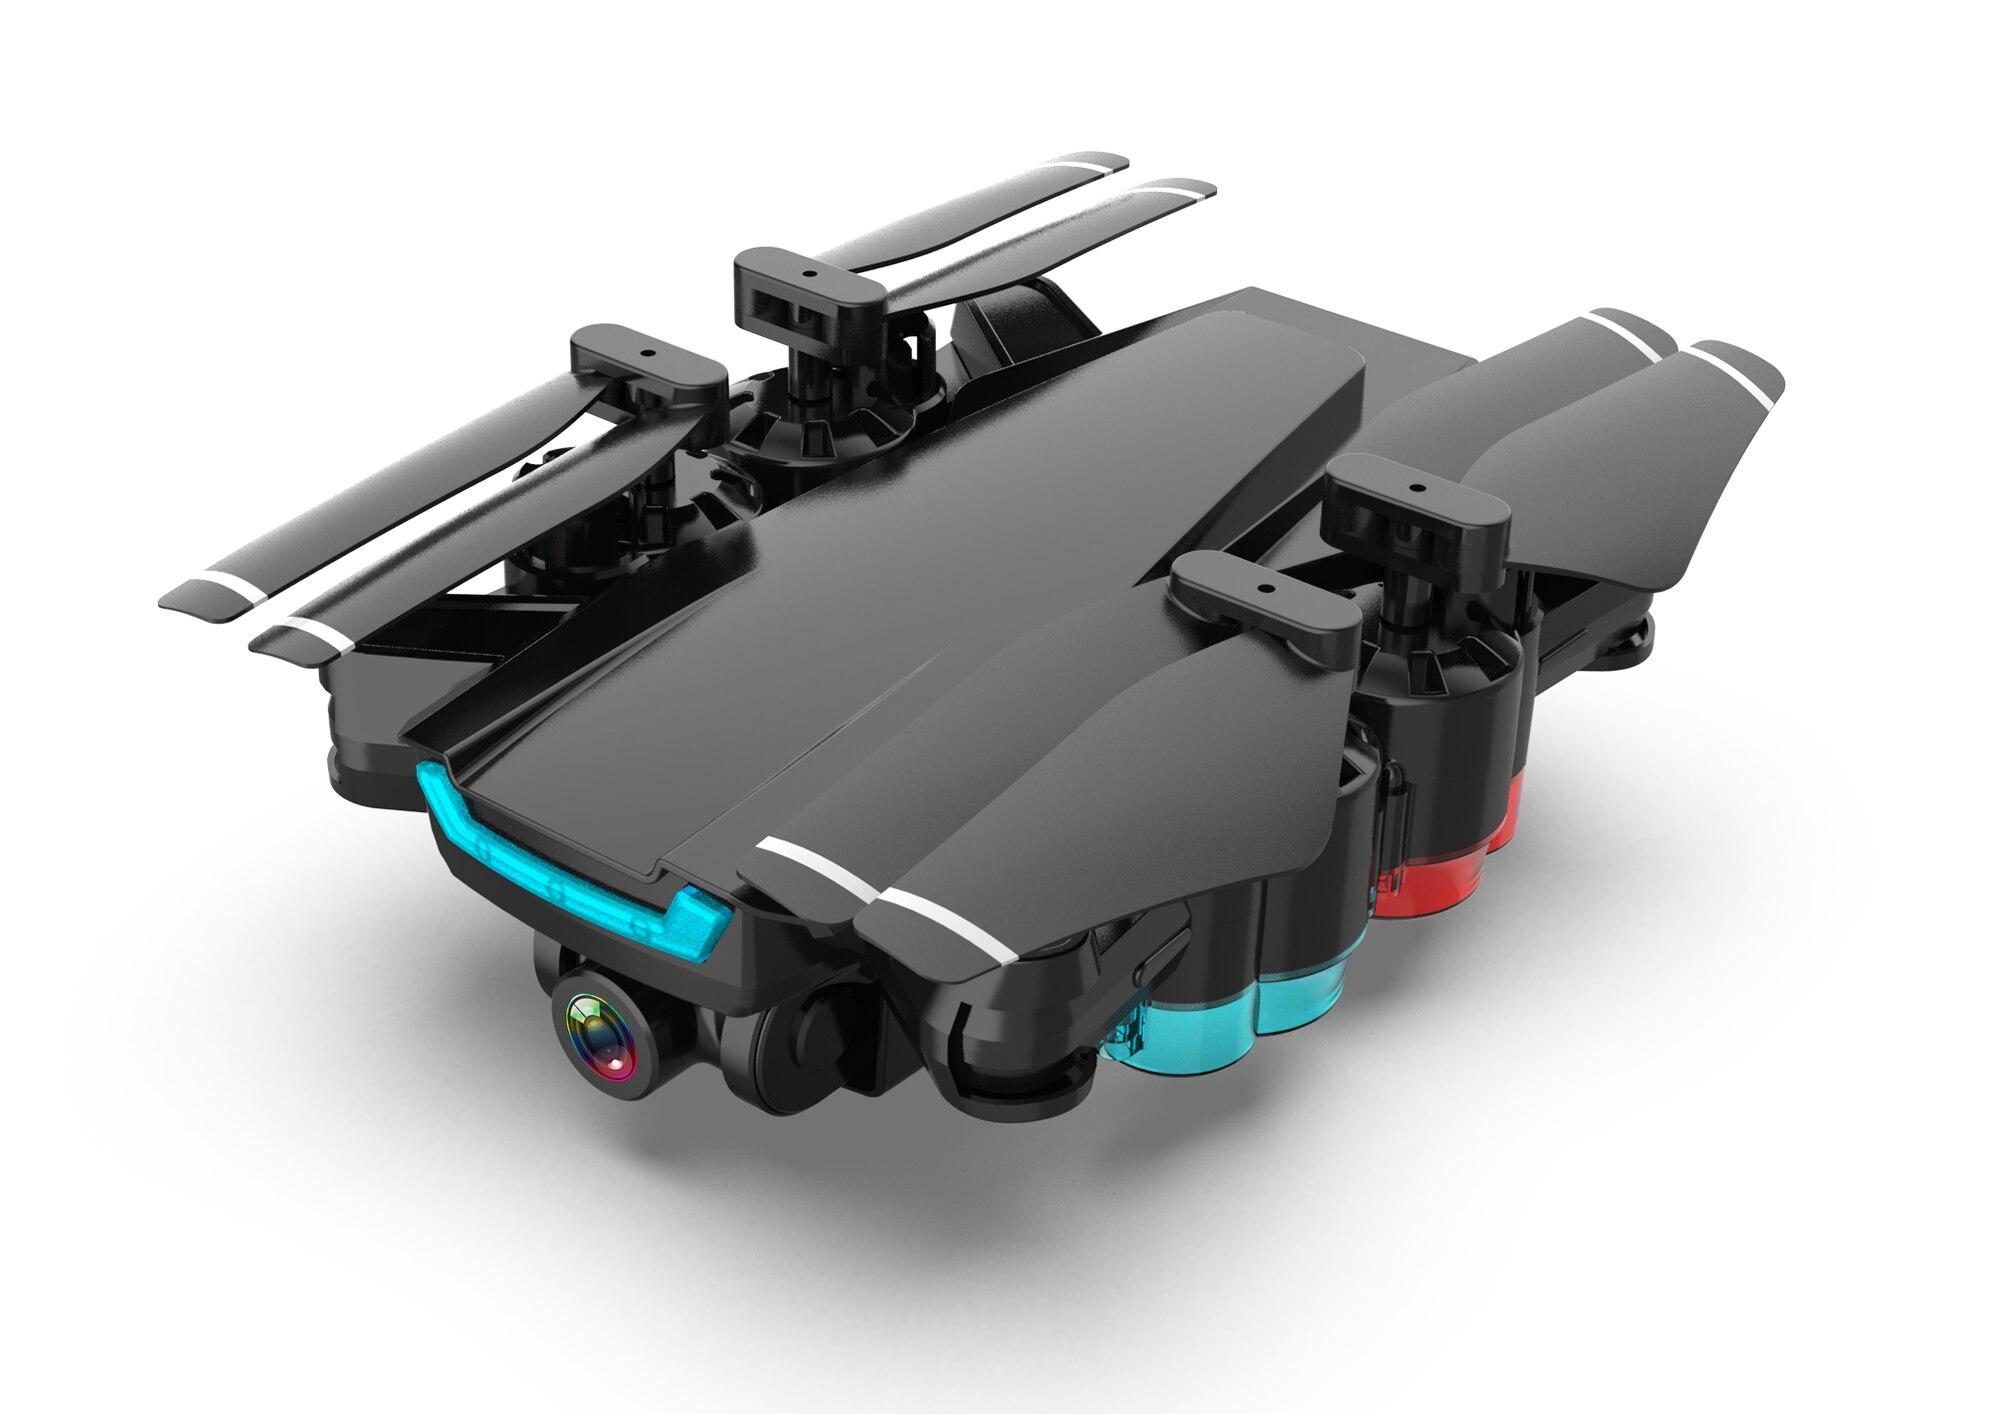 K2 Drone 4k HD caméra drone 1080P WIFI FPV drone vidéo quadrirotor en direct altitude garder drone avec caméra RC hélicoptère dron jouet drone camera drones mini drone profissional fpv toys - 2